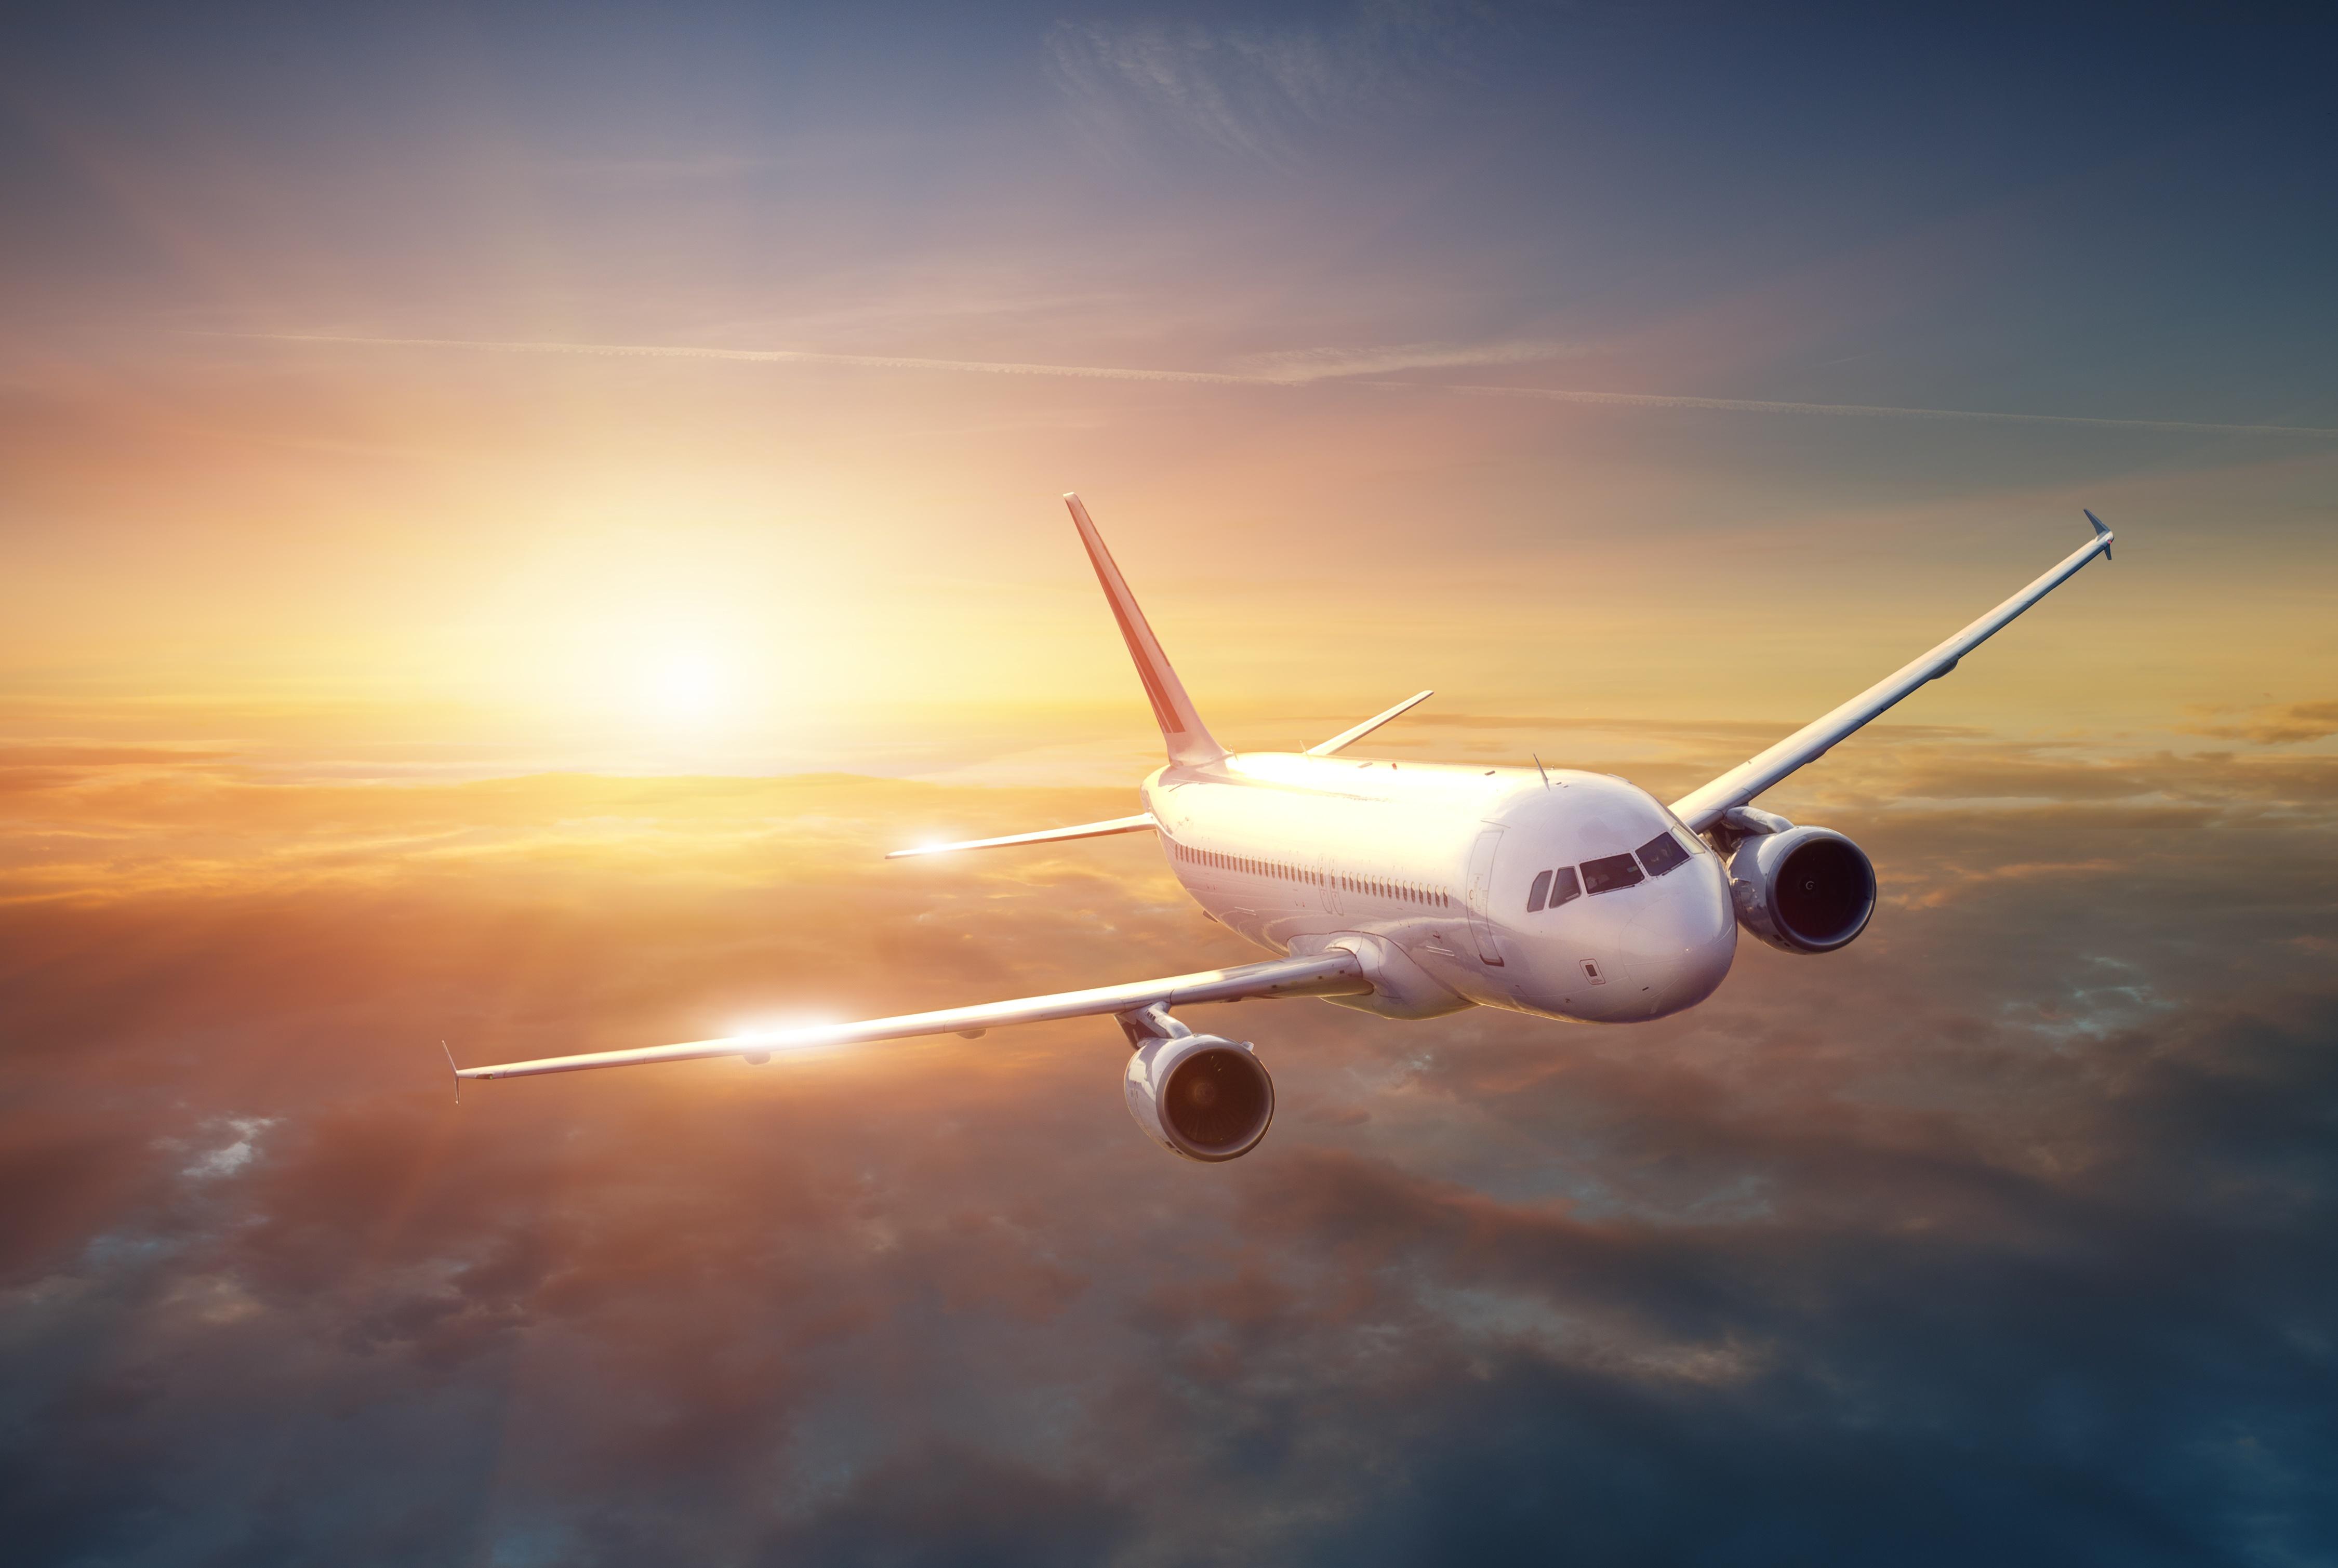 Airplane flying through skies.